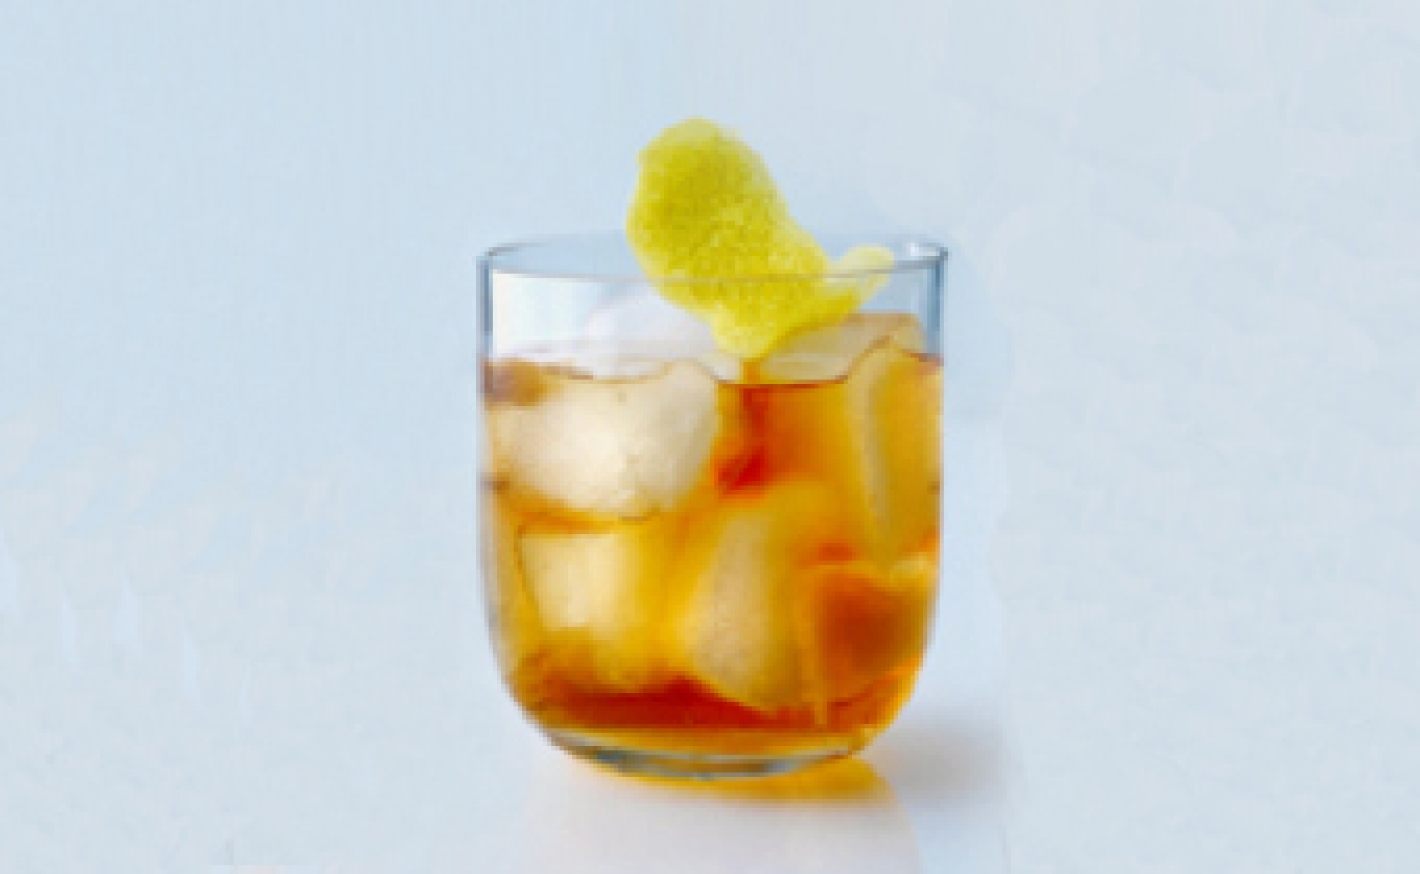 Apfelbowle mit Zitronenthymian